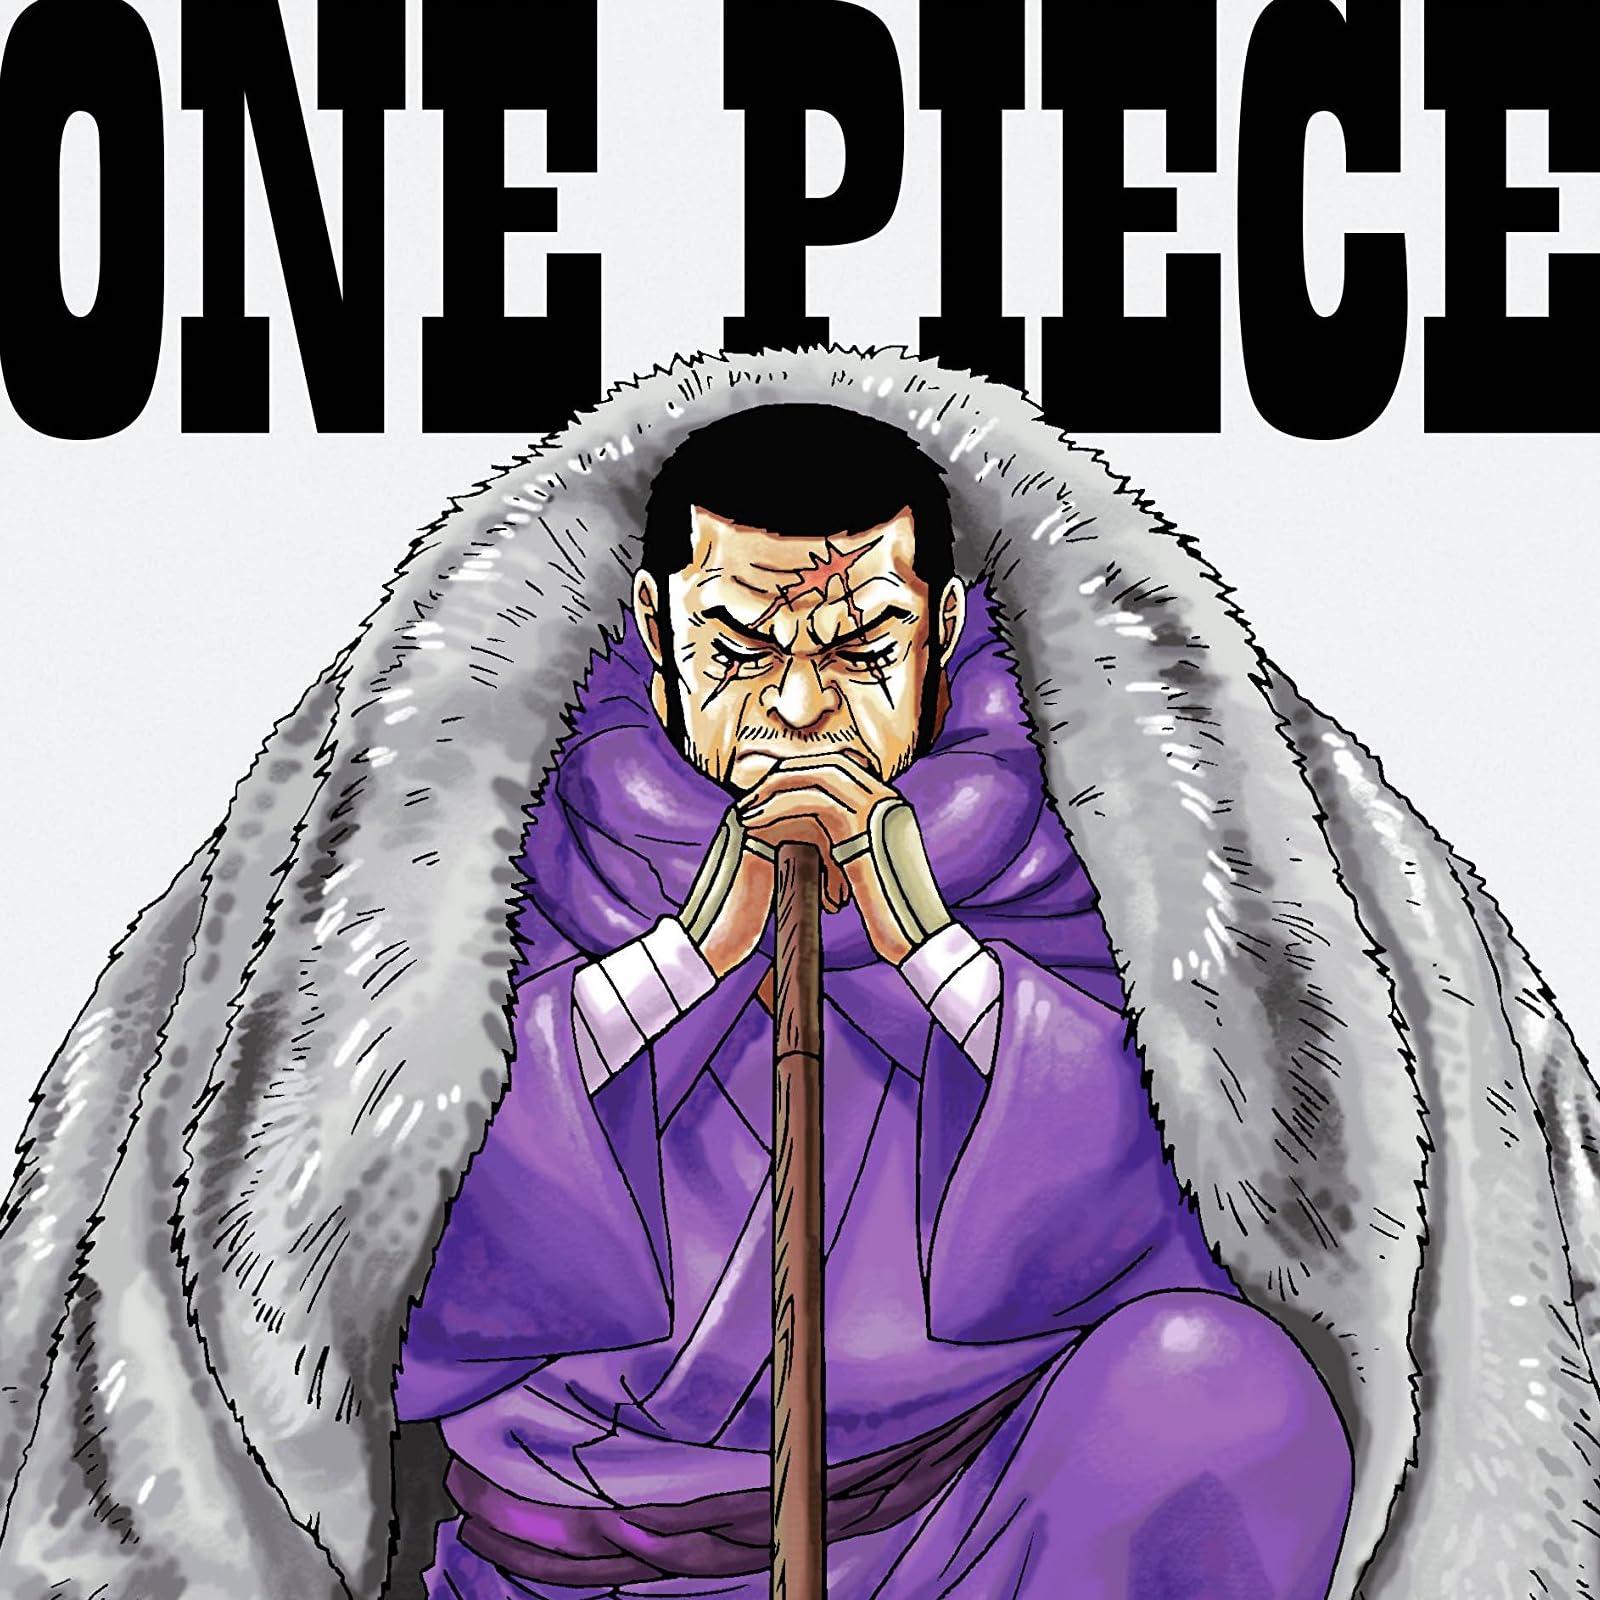 One Piece Ipad壁紙 イッショウ 藤虎 アニメ スマホ用画像132498